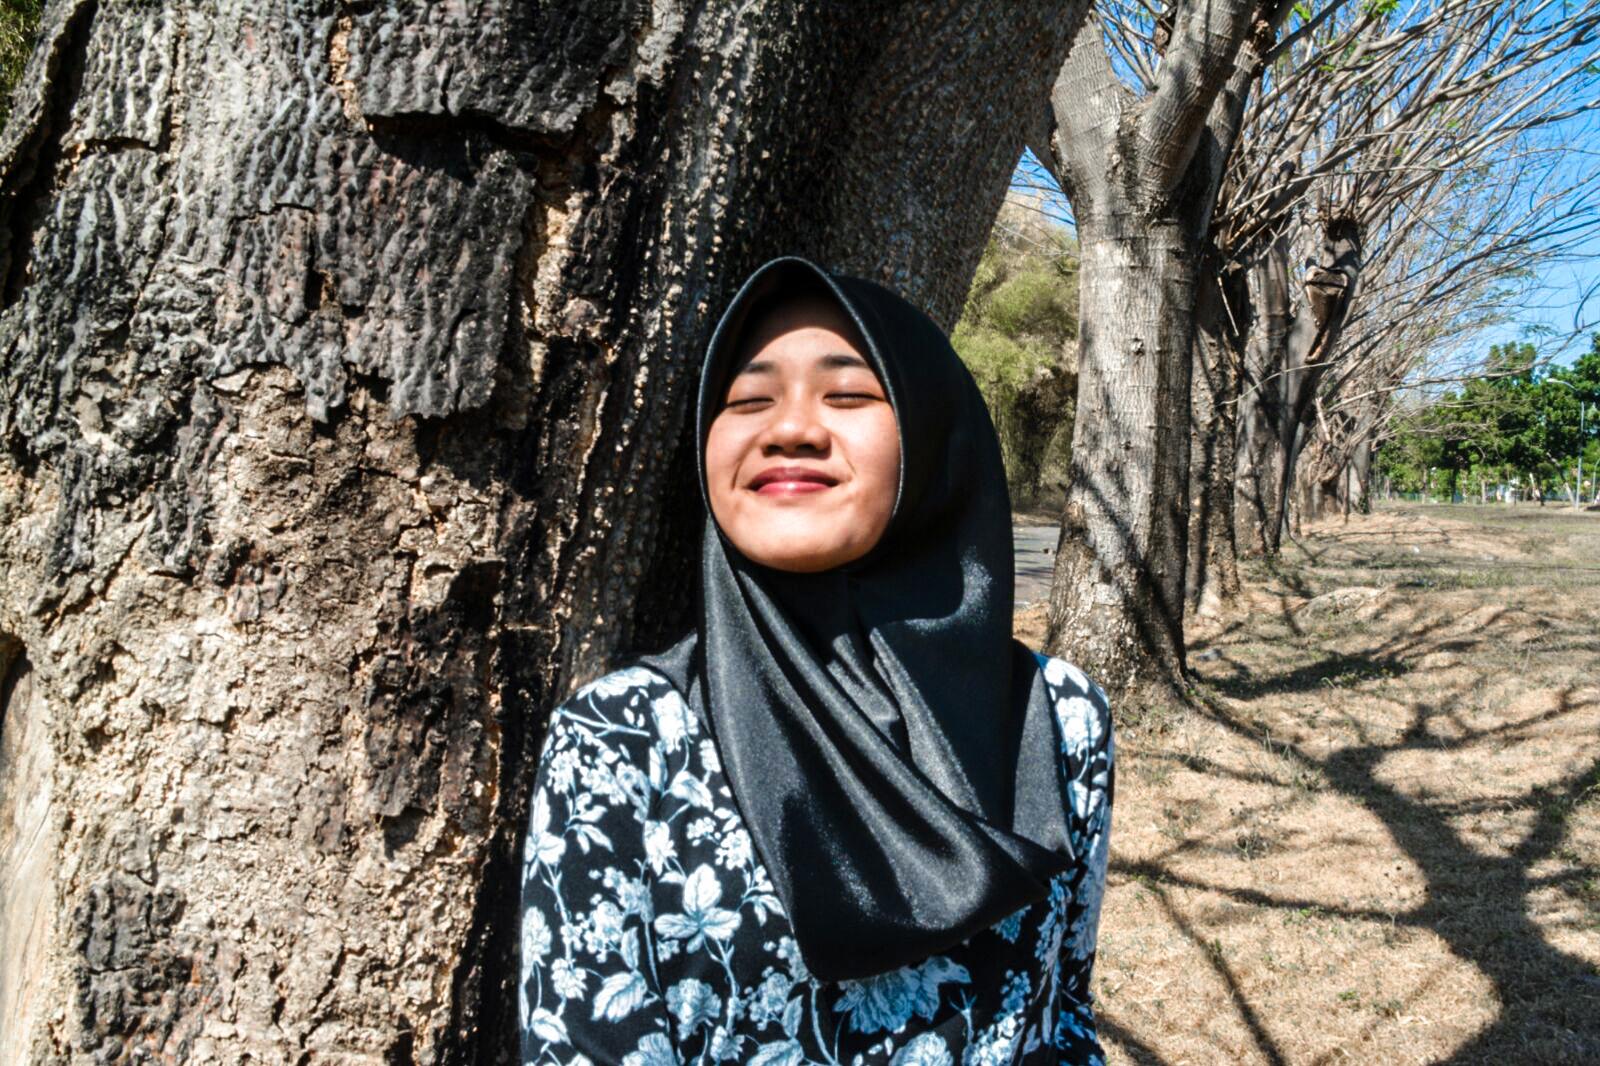 Jalan Gula Surabaya Siluet Senja Taman Sakura Keputih Kota